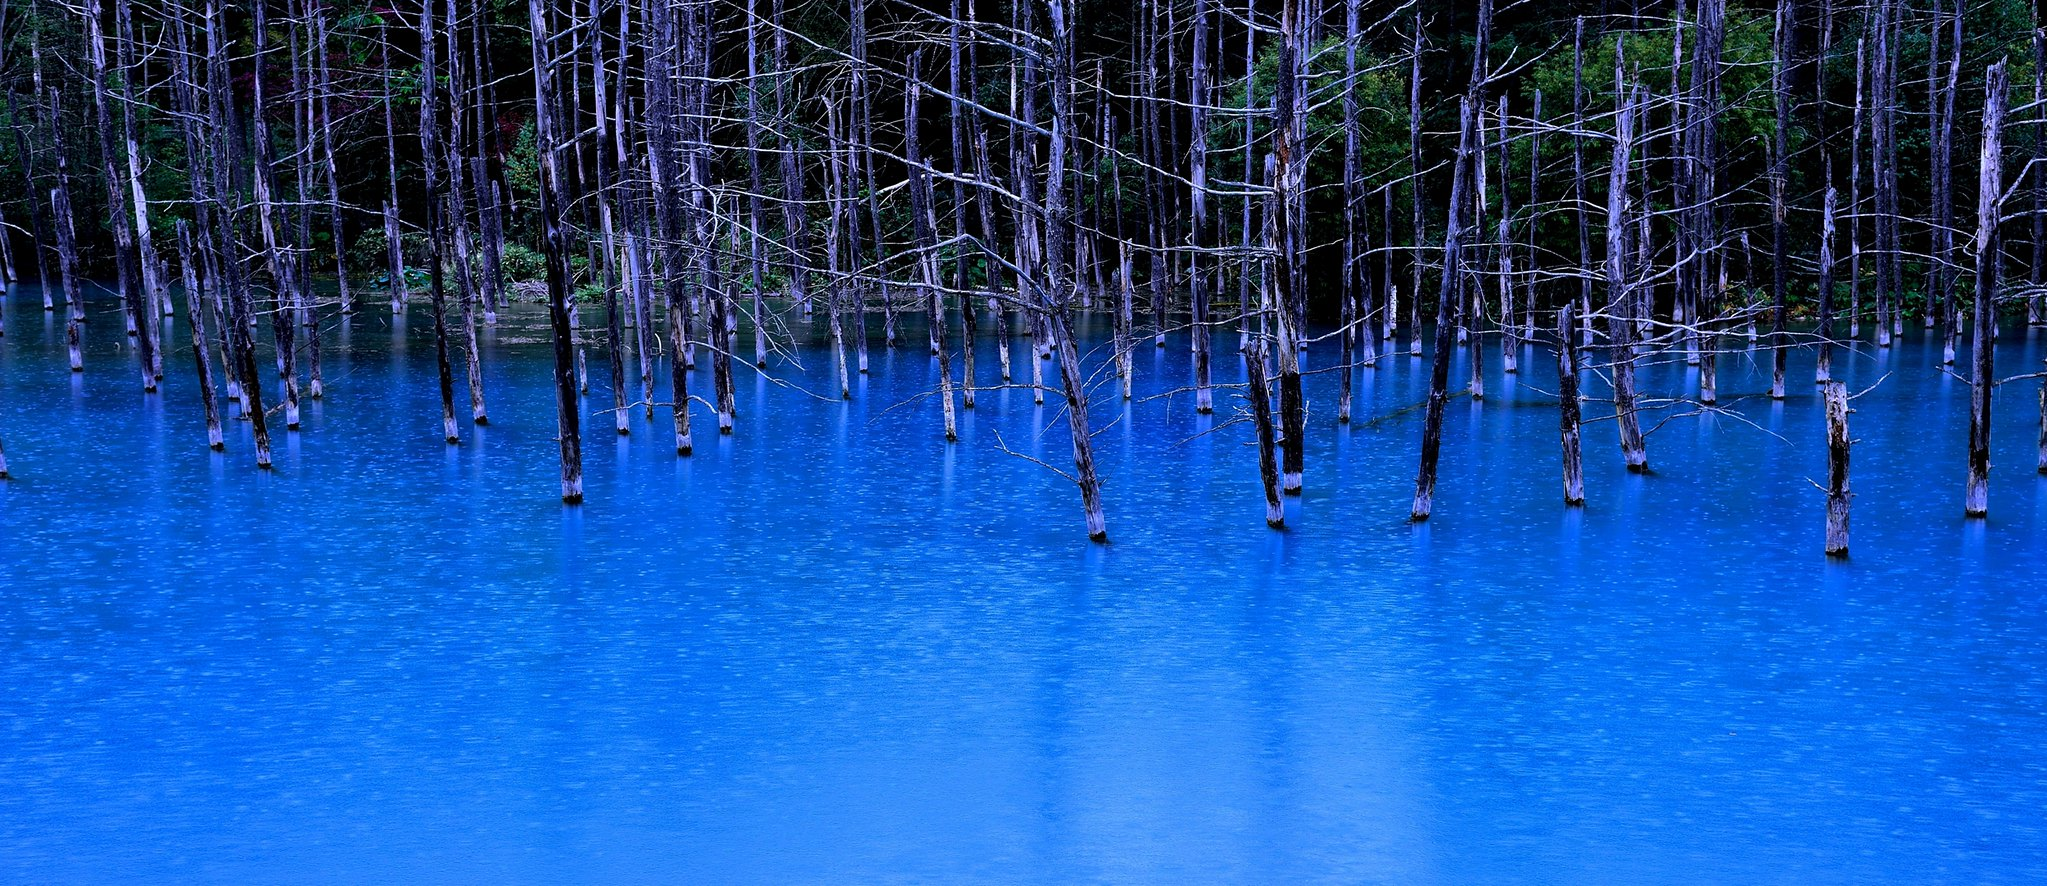 stagno blu